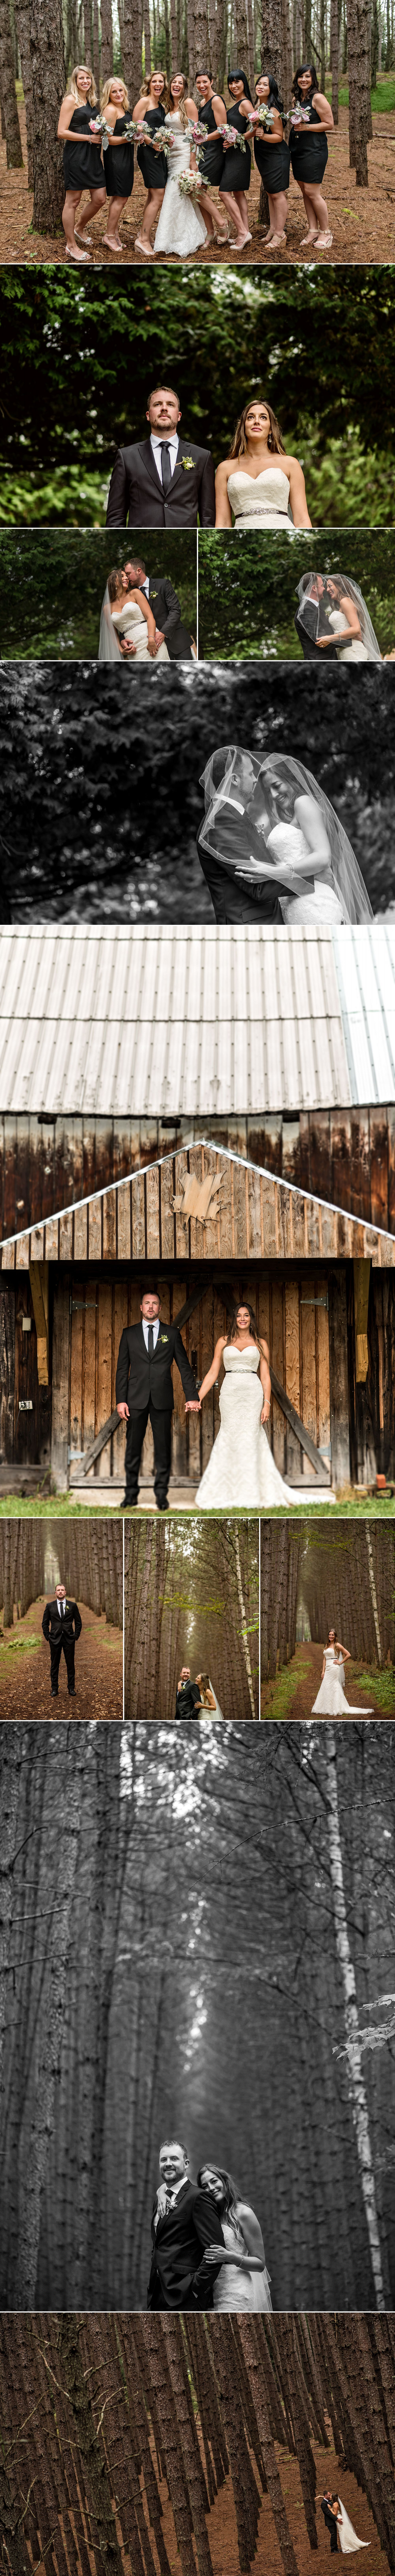 Rustic wedding photographs